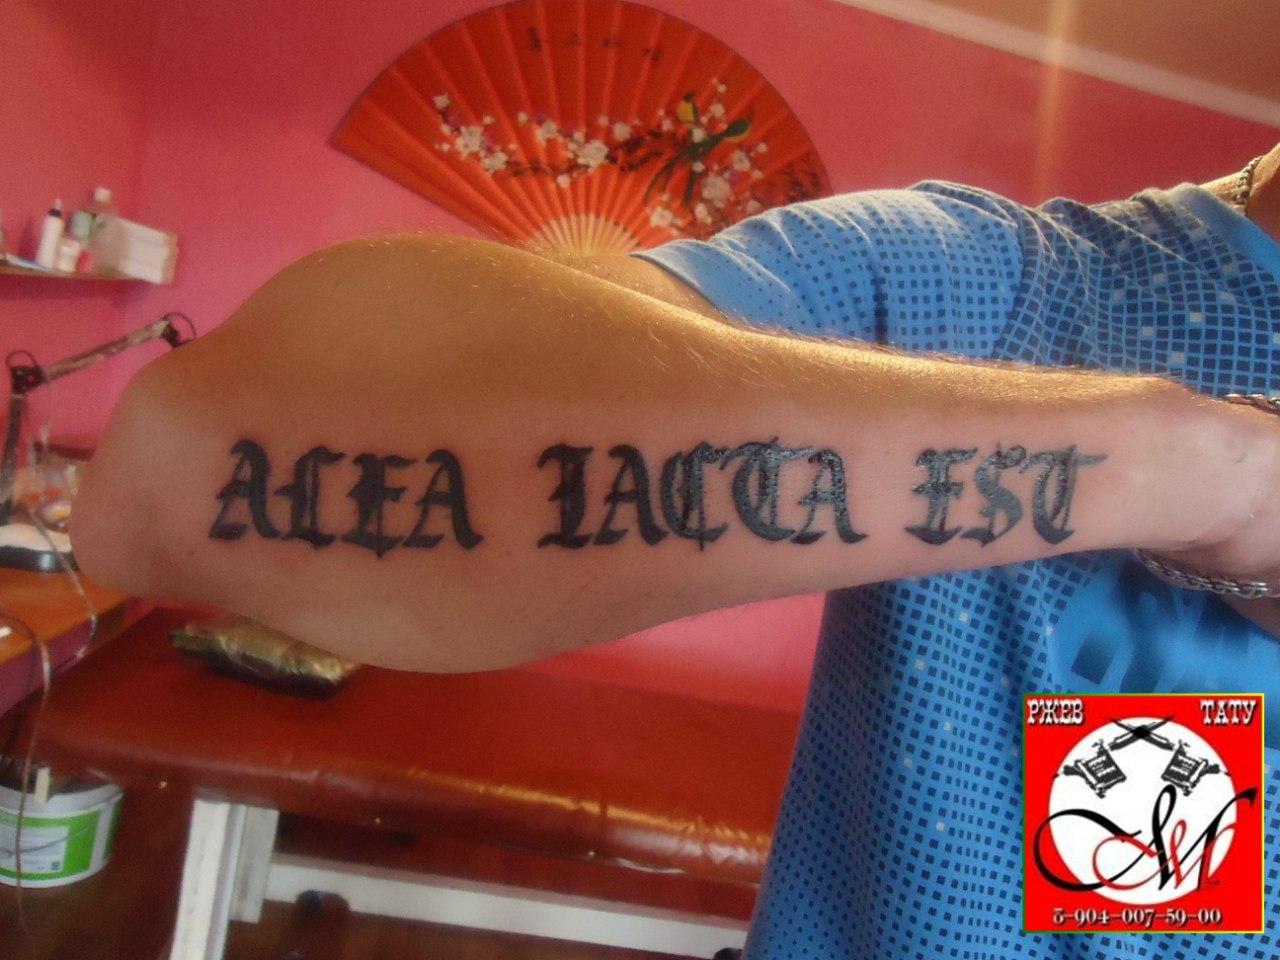 Я есть на латыни тату фото